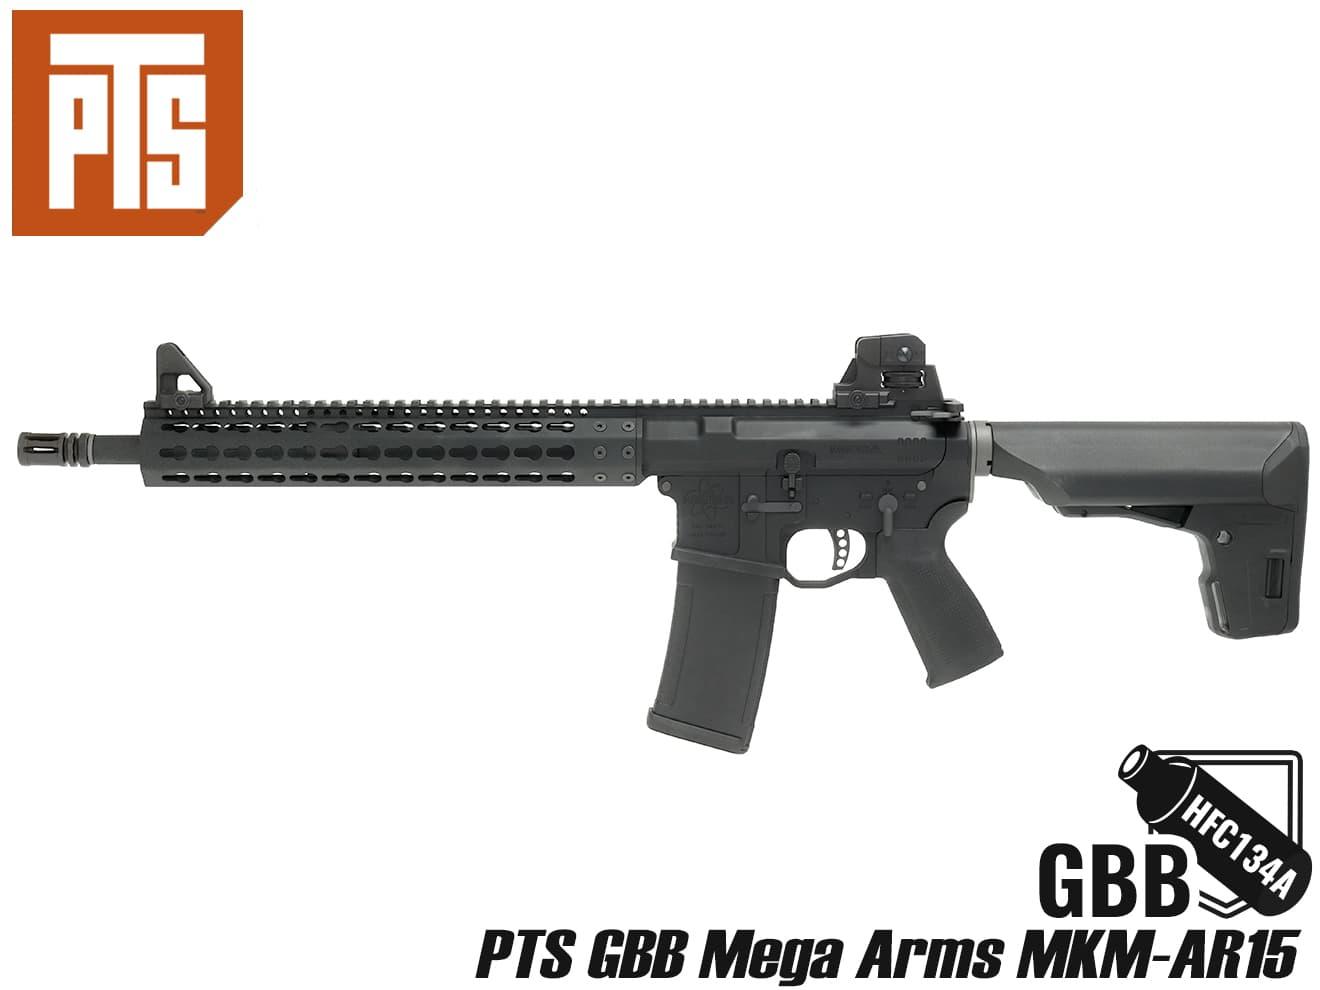 PTS Mega Arms MKM-AR15 GBB(KSCエンジン搭載)◆ガスブローバック MEGA ARMS正規ライセンス取得 ビレットレシーバー 高剛性/高精度 BK画像